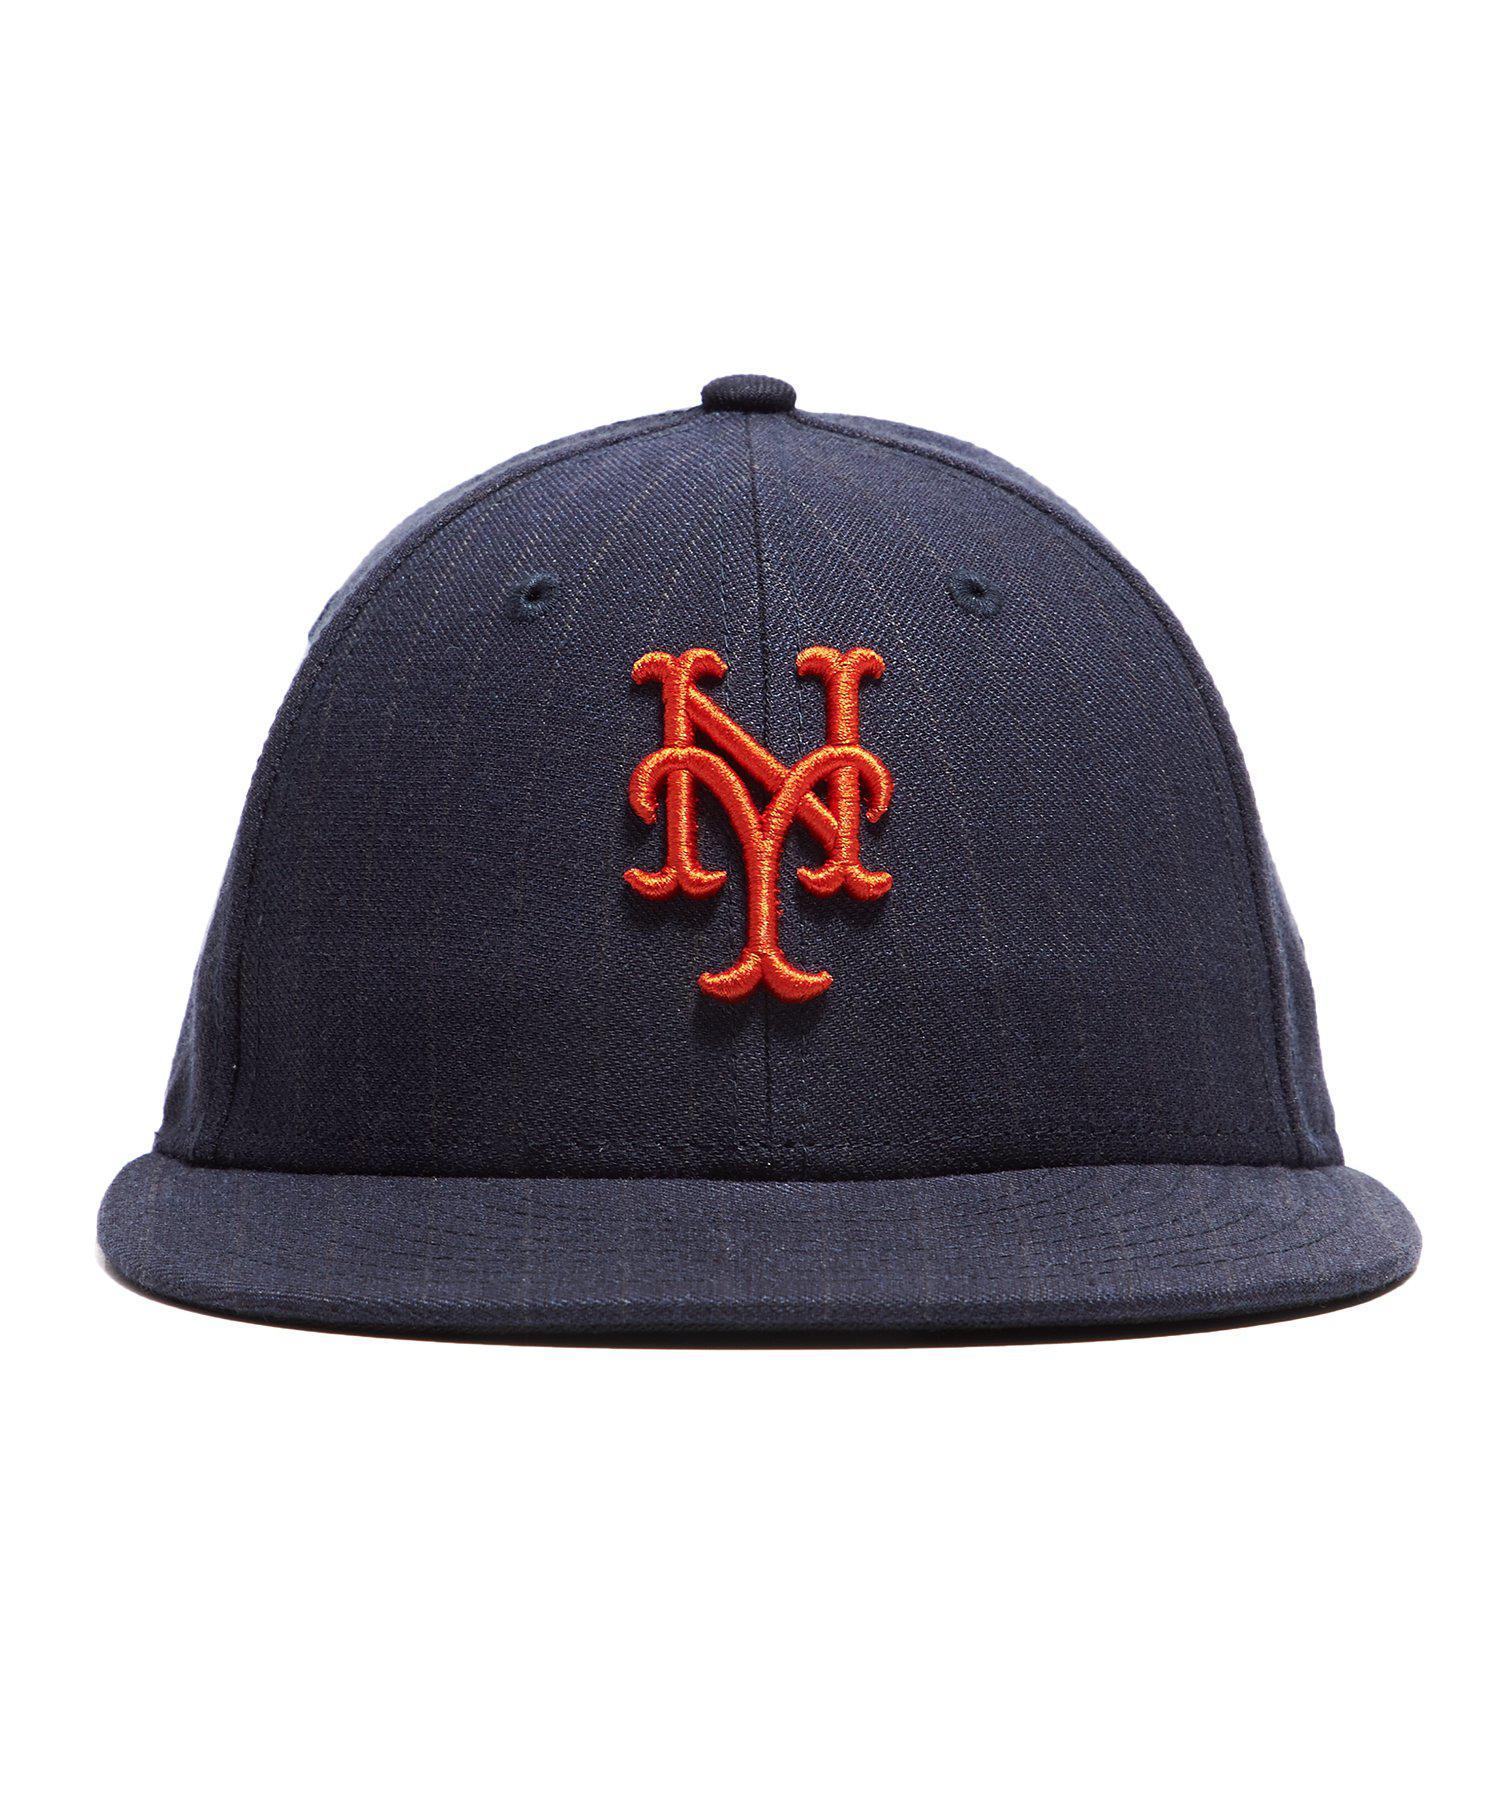 2bd752b35d5 Lyst - NEW ERA HATS New York Mets Cap In Navy Pinstripe in Blue for Men